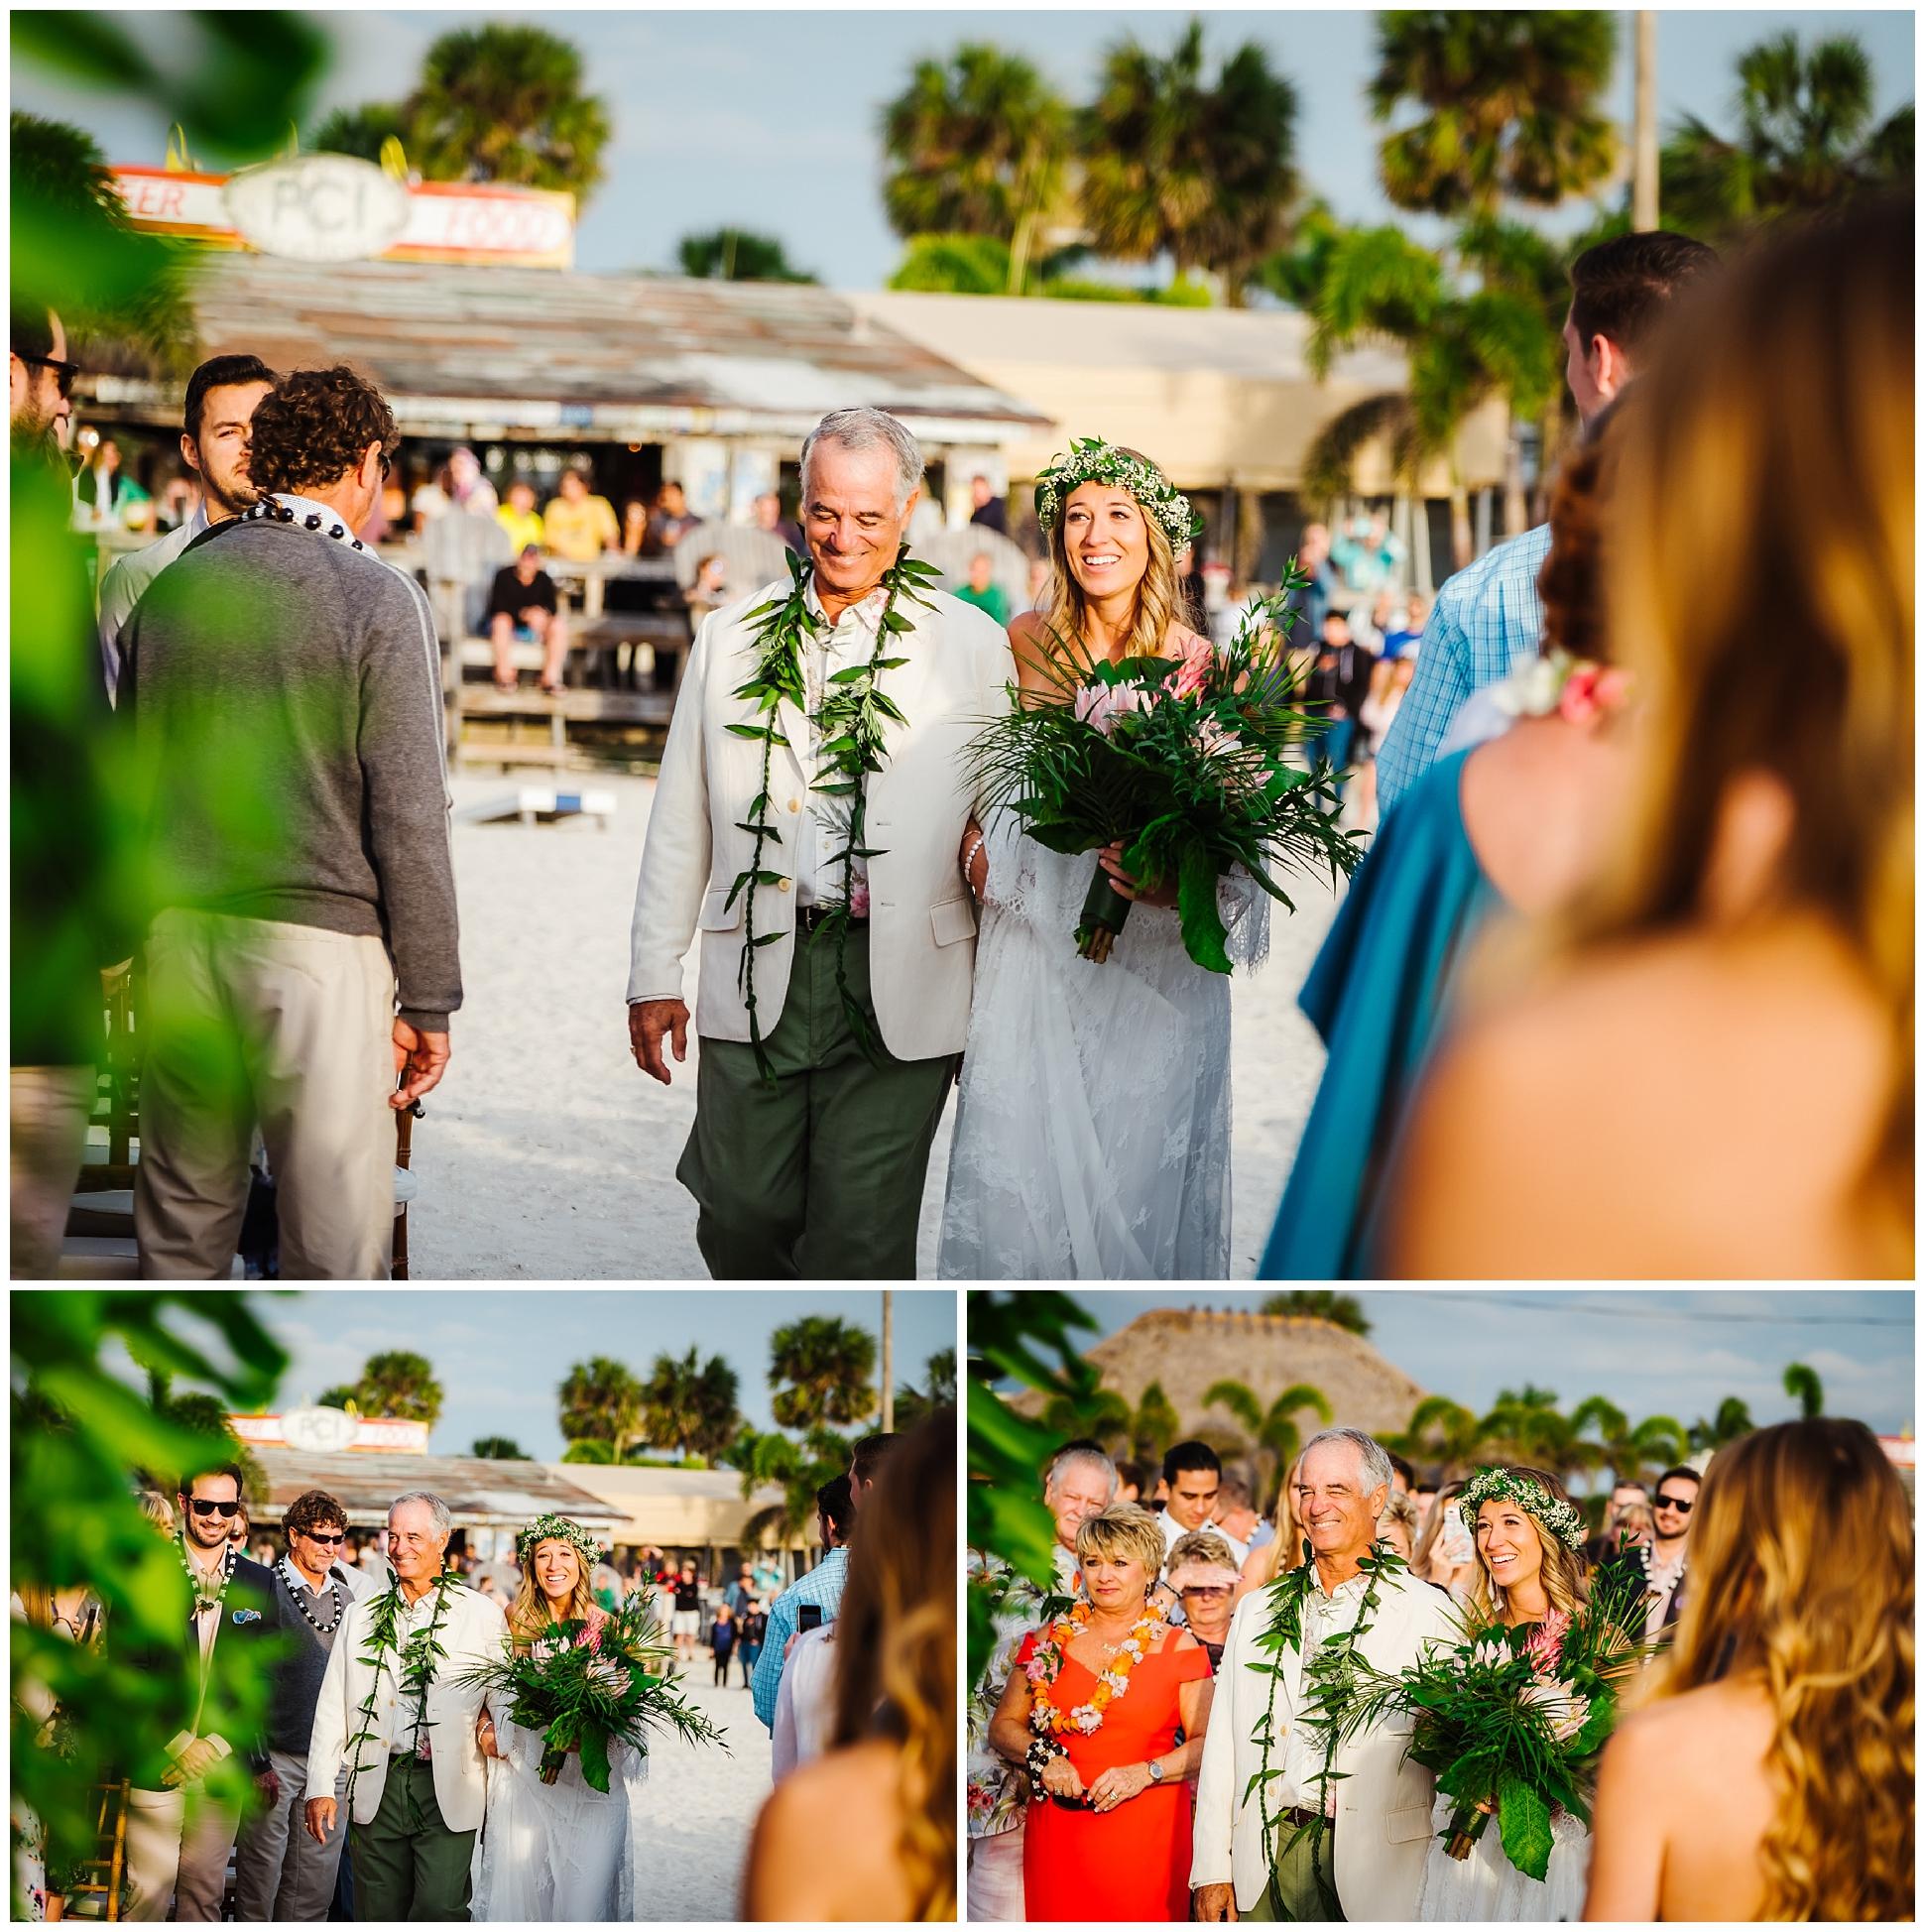 tampa-bay-wedding-photographer-barefoot-post-card-inn-tropical-hawaiin-lei-pink-pineapples-flower-crown_0168.jpg